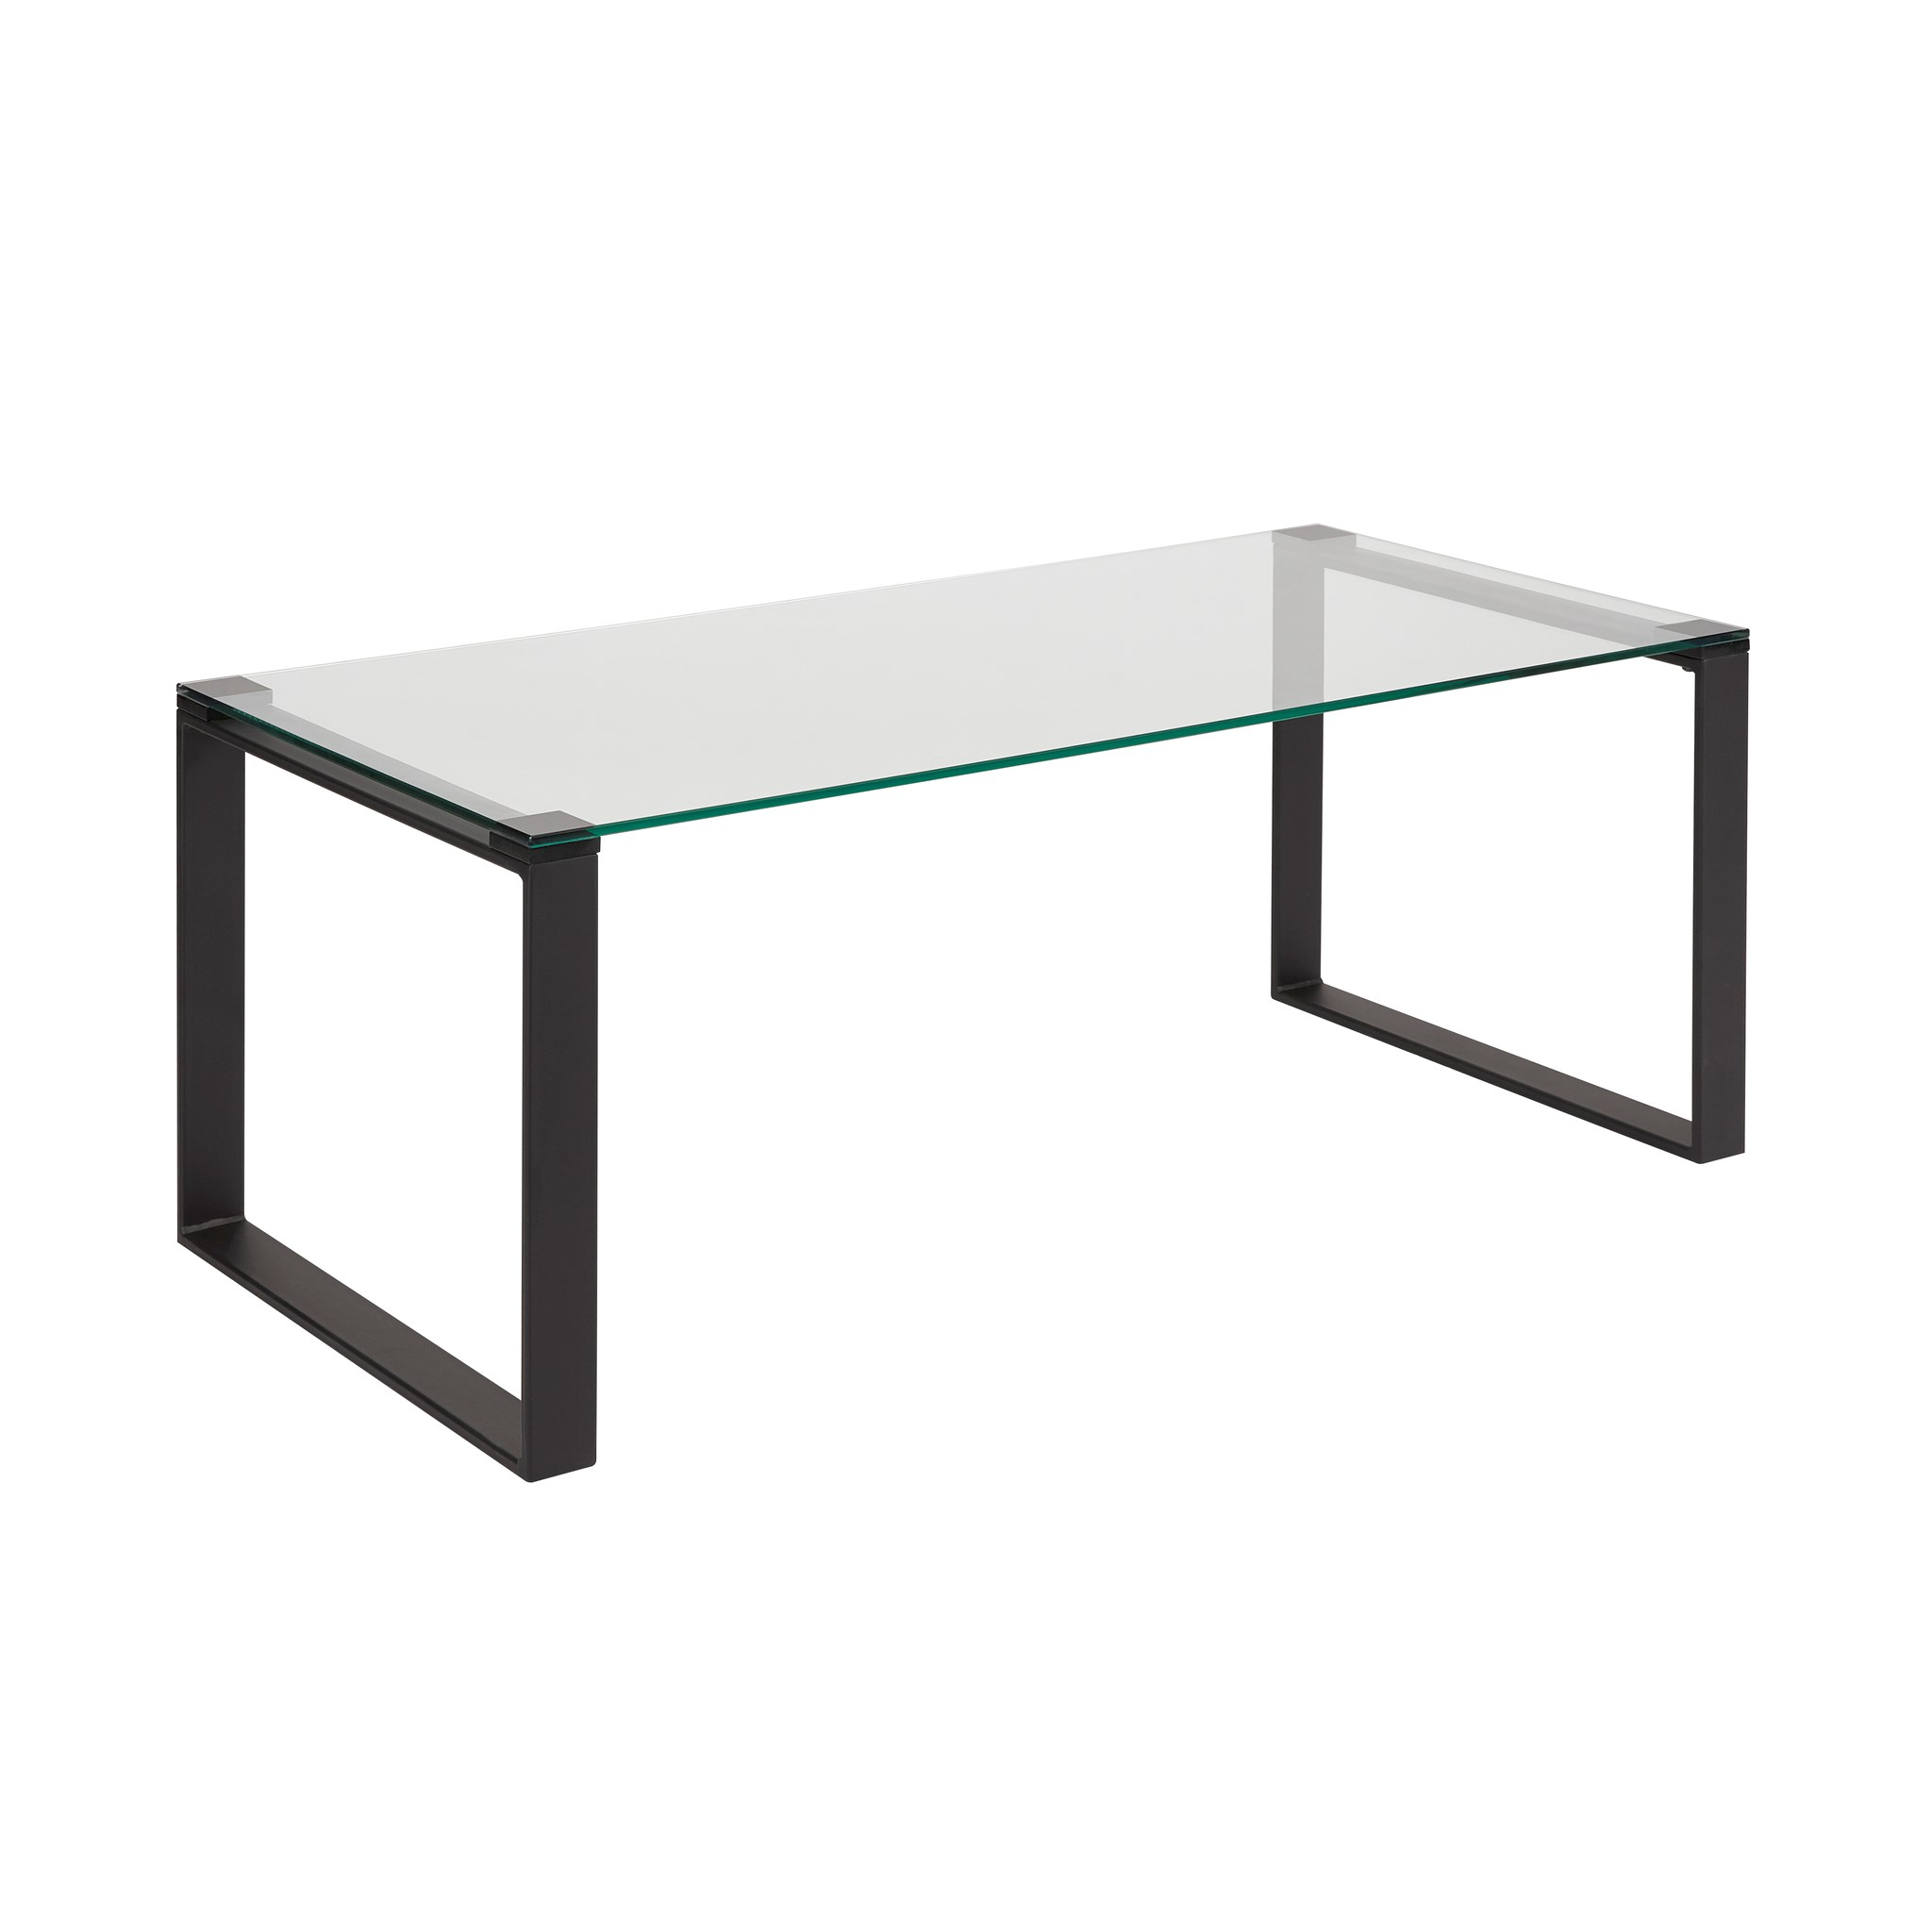 David Coffee Table Black Metal